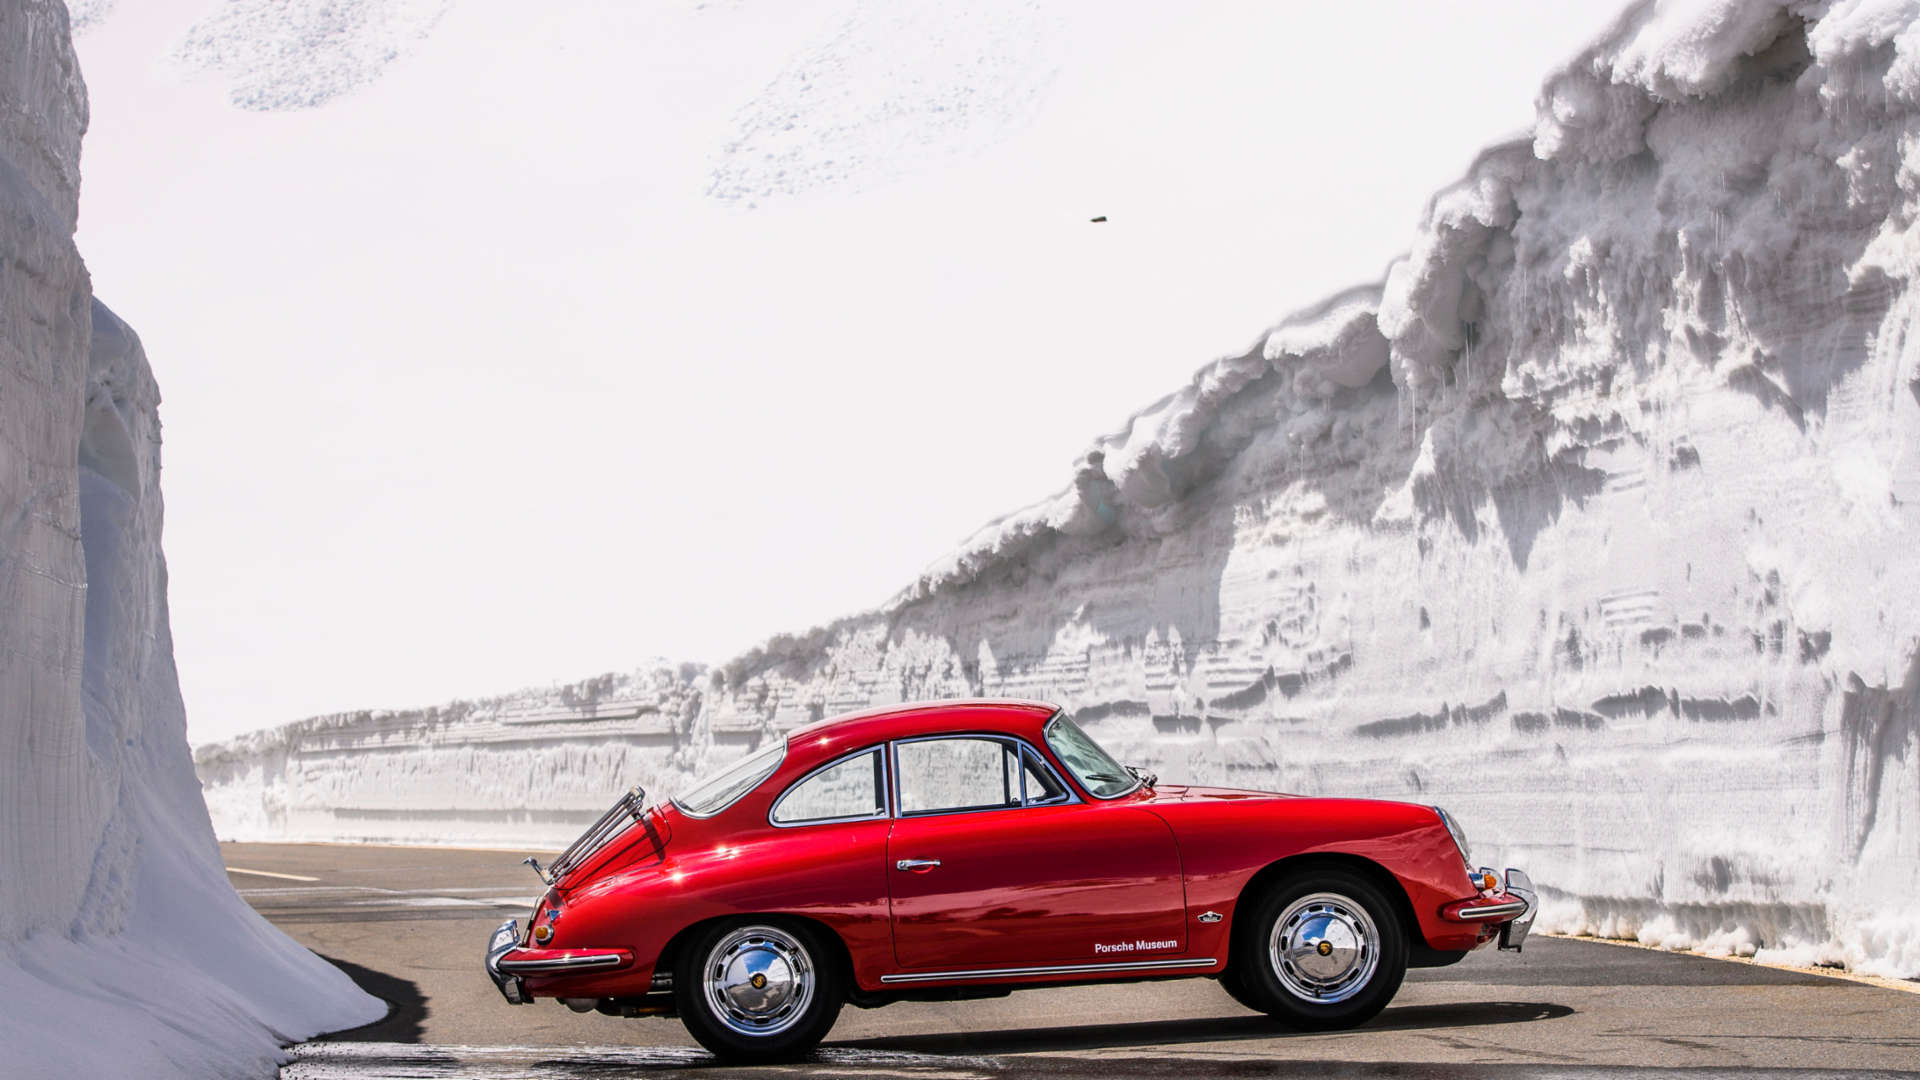 Porsche 356 B Sprung